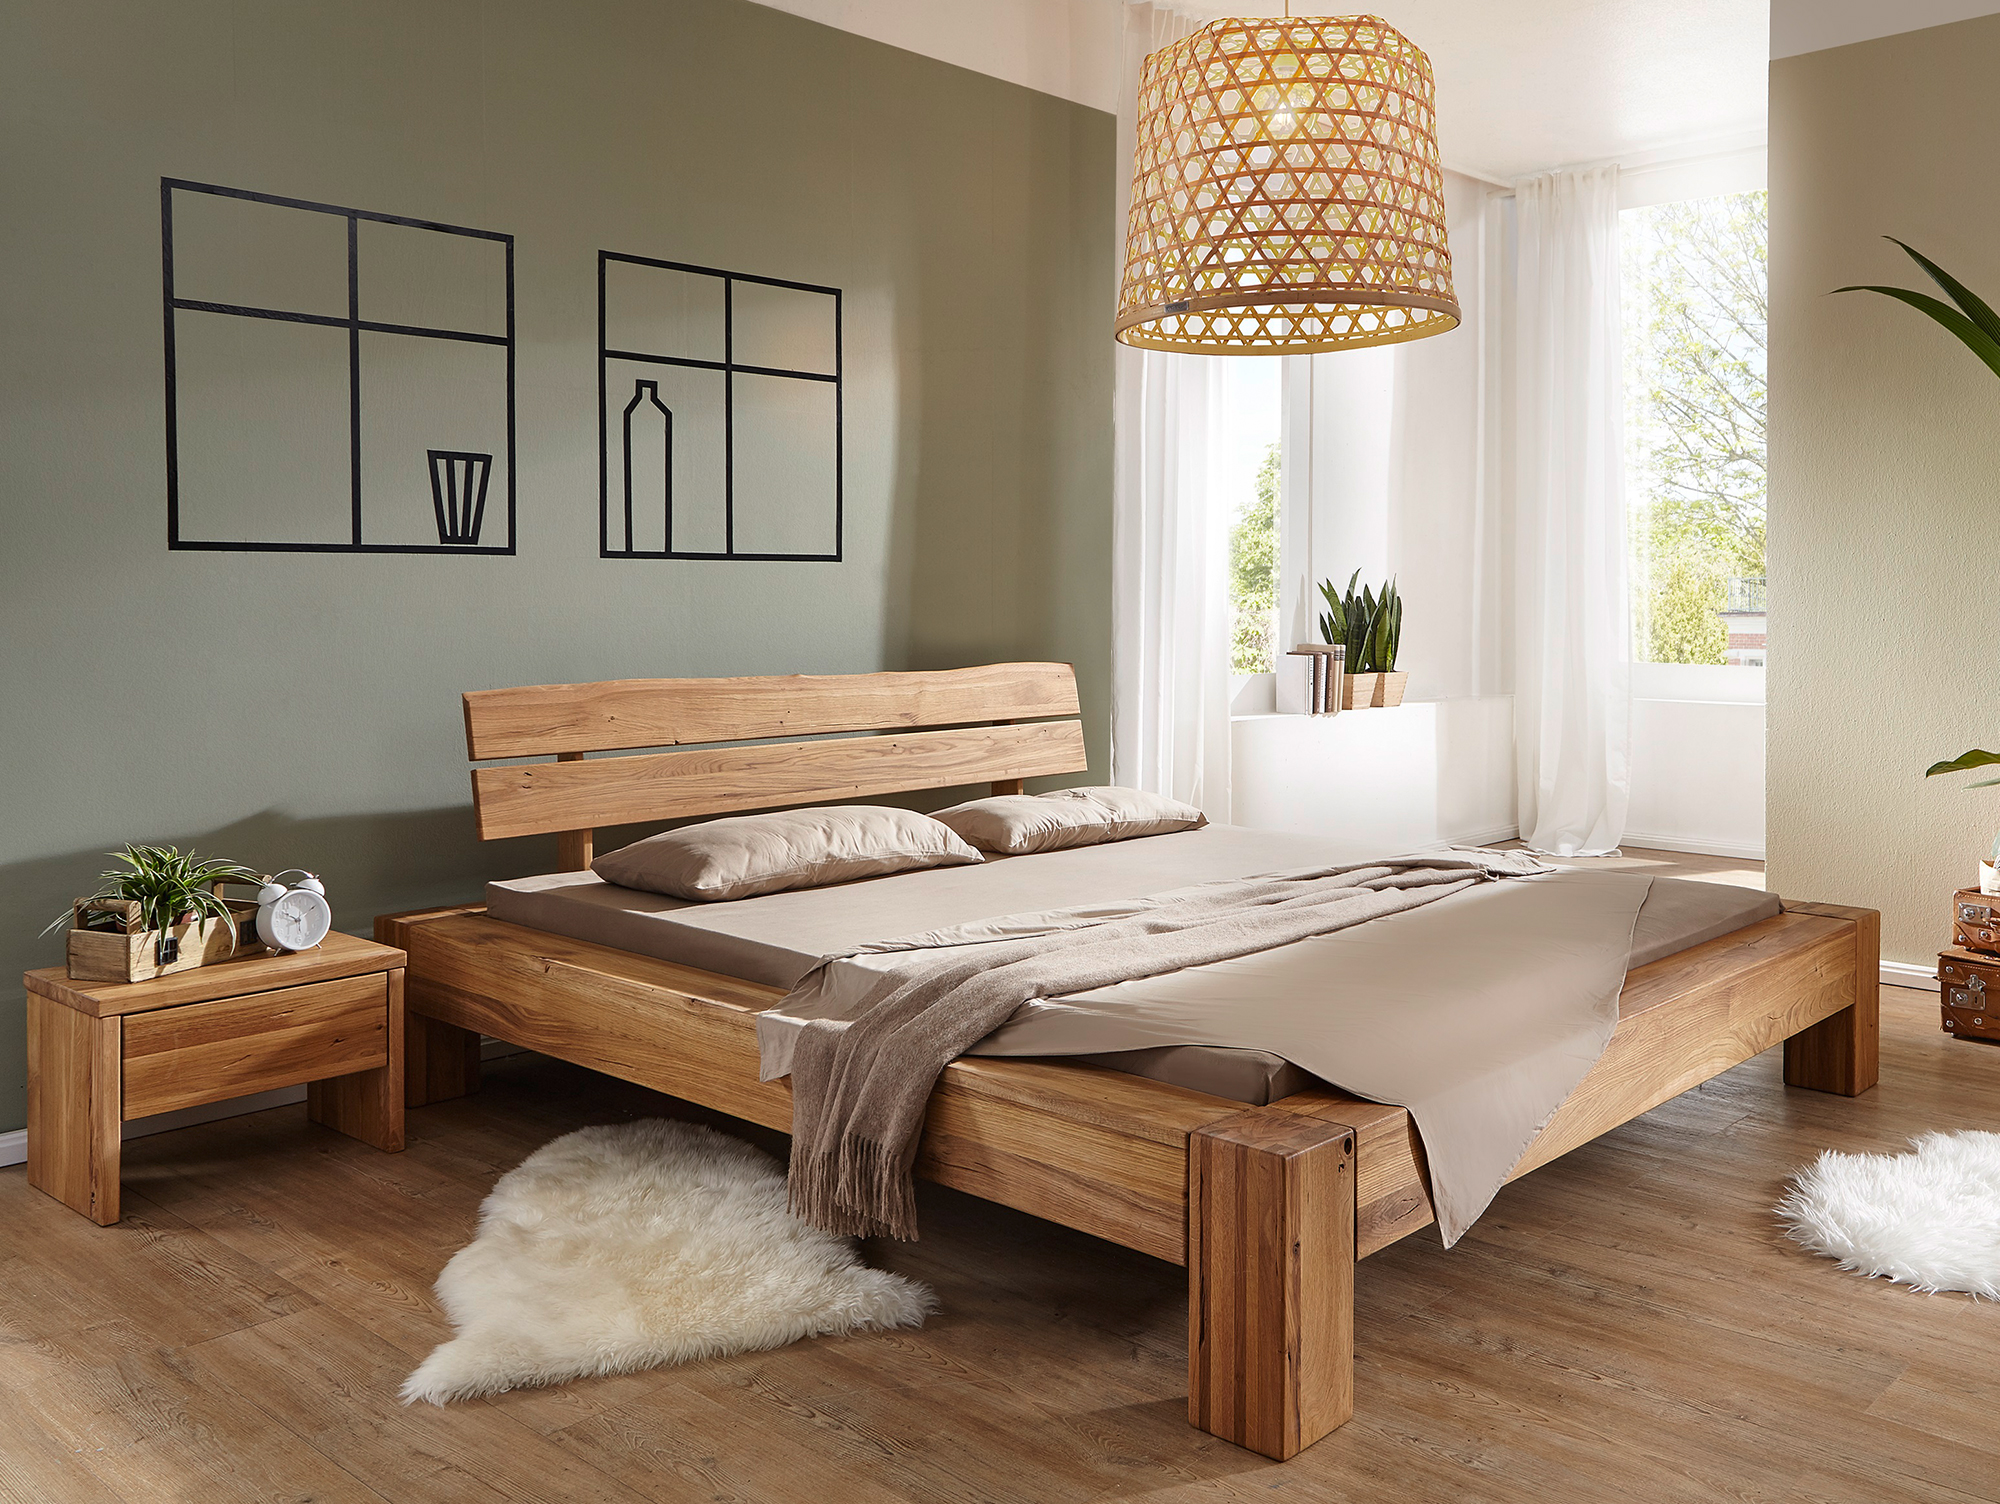 benissa doppelbett wildeiche ge lt 160 x 200 cm. Black Bedroom Furniture Sets. Home Design Ideas